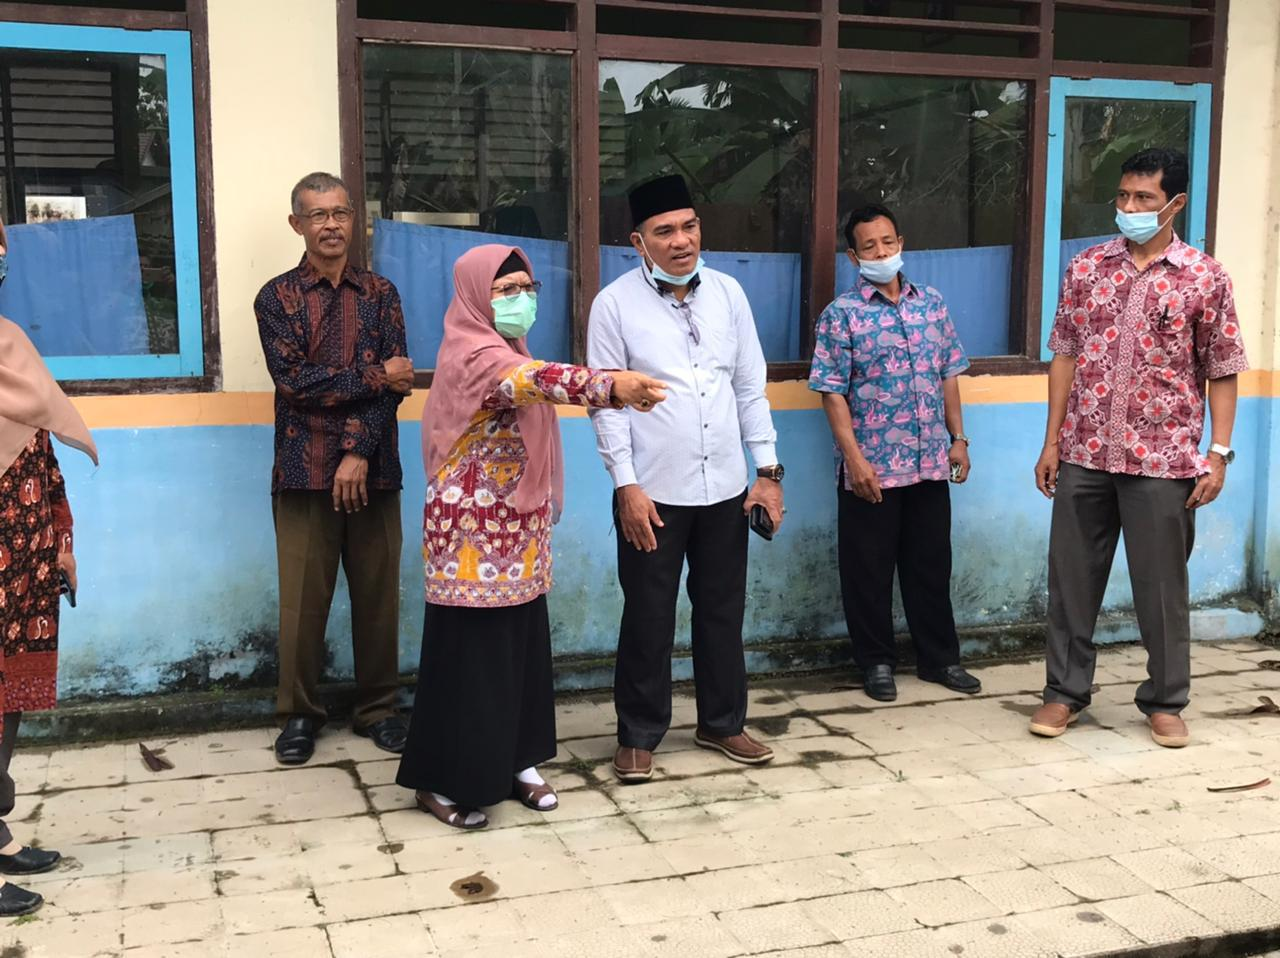 anggota DPRD Muaro Jambi, Zulkifli I saat meninjau sarana dan prasarana SMPN 1 Muaro Jambi.